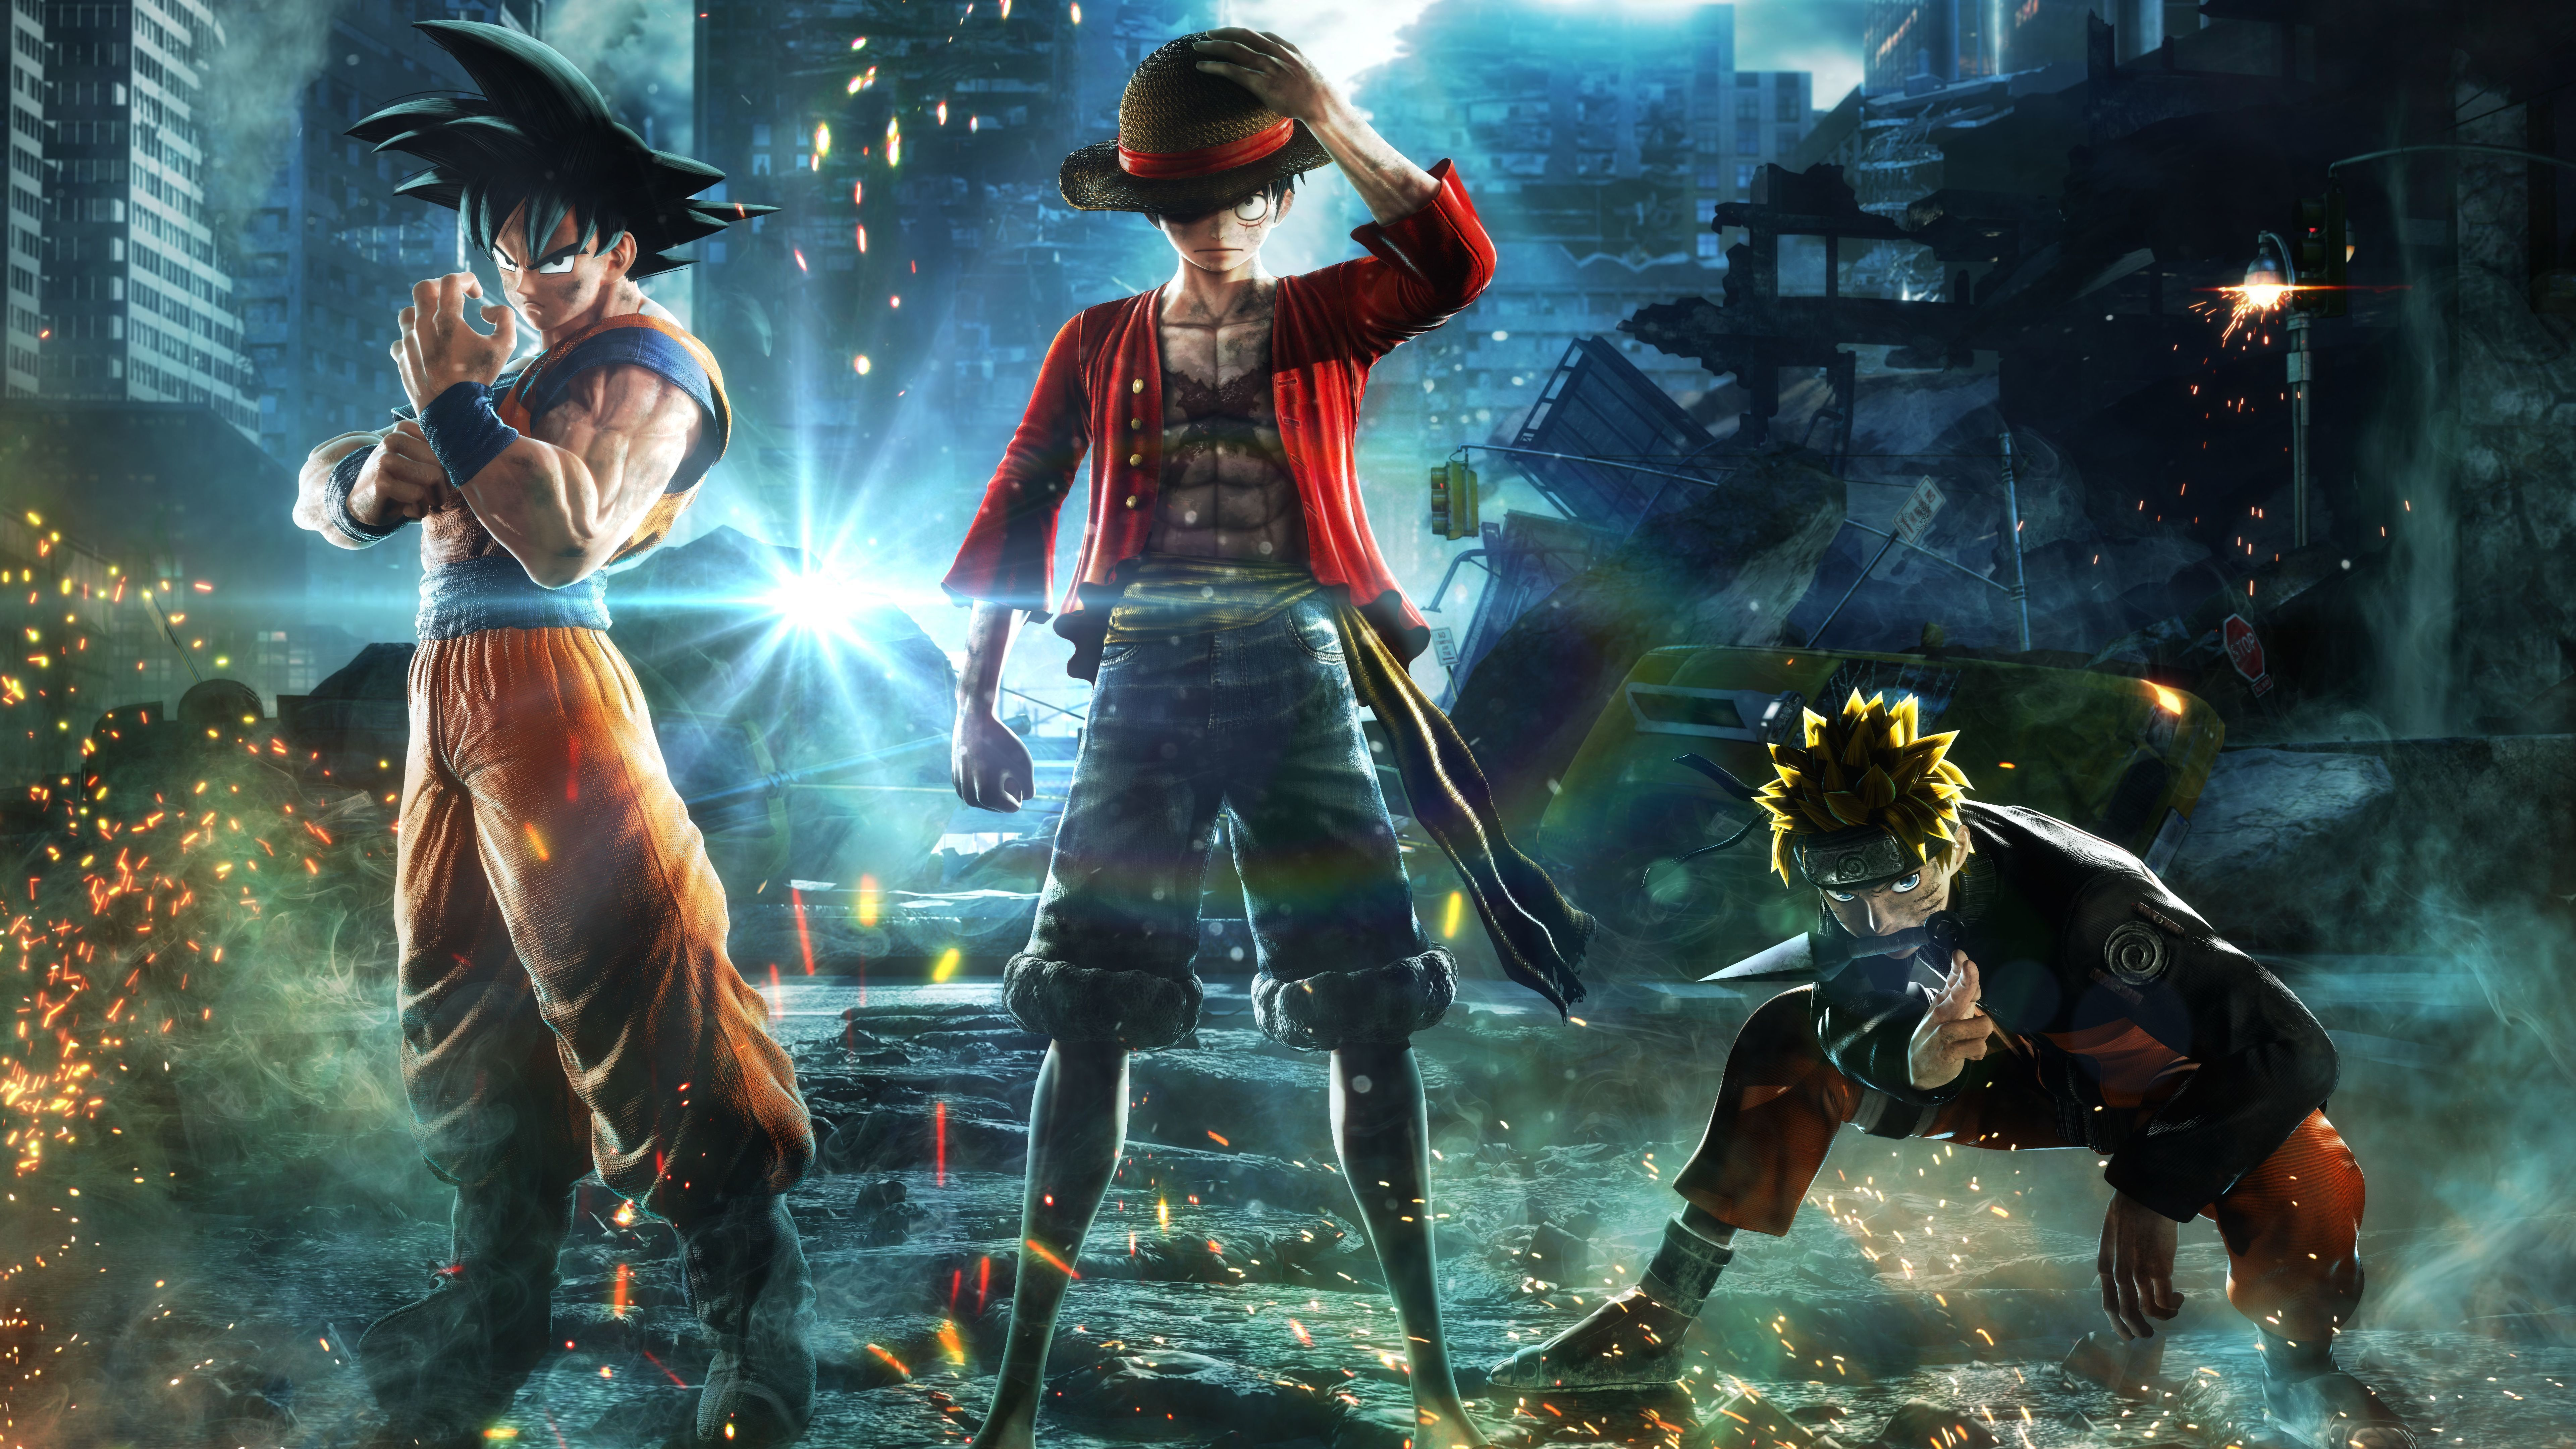 Anime Wallpaper 4k Pc Naruto